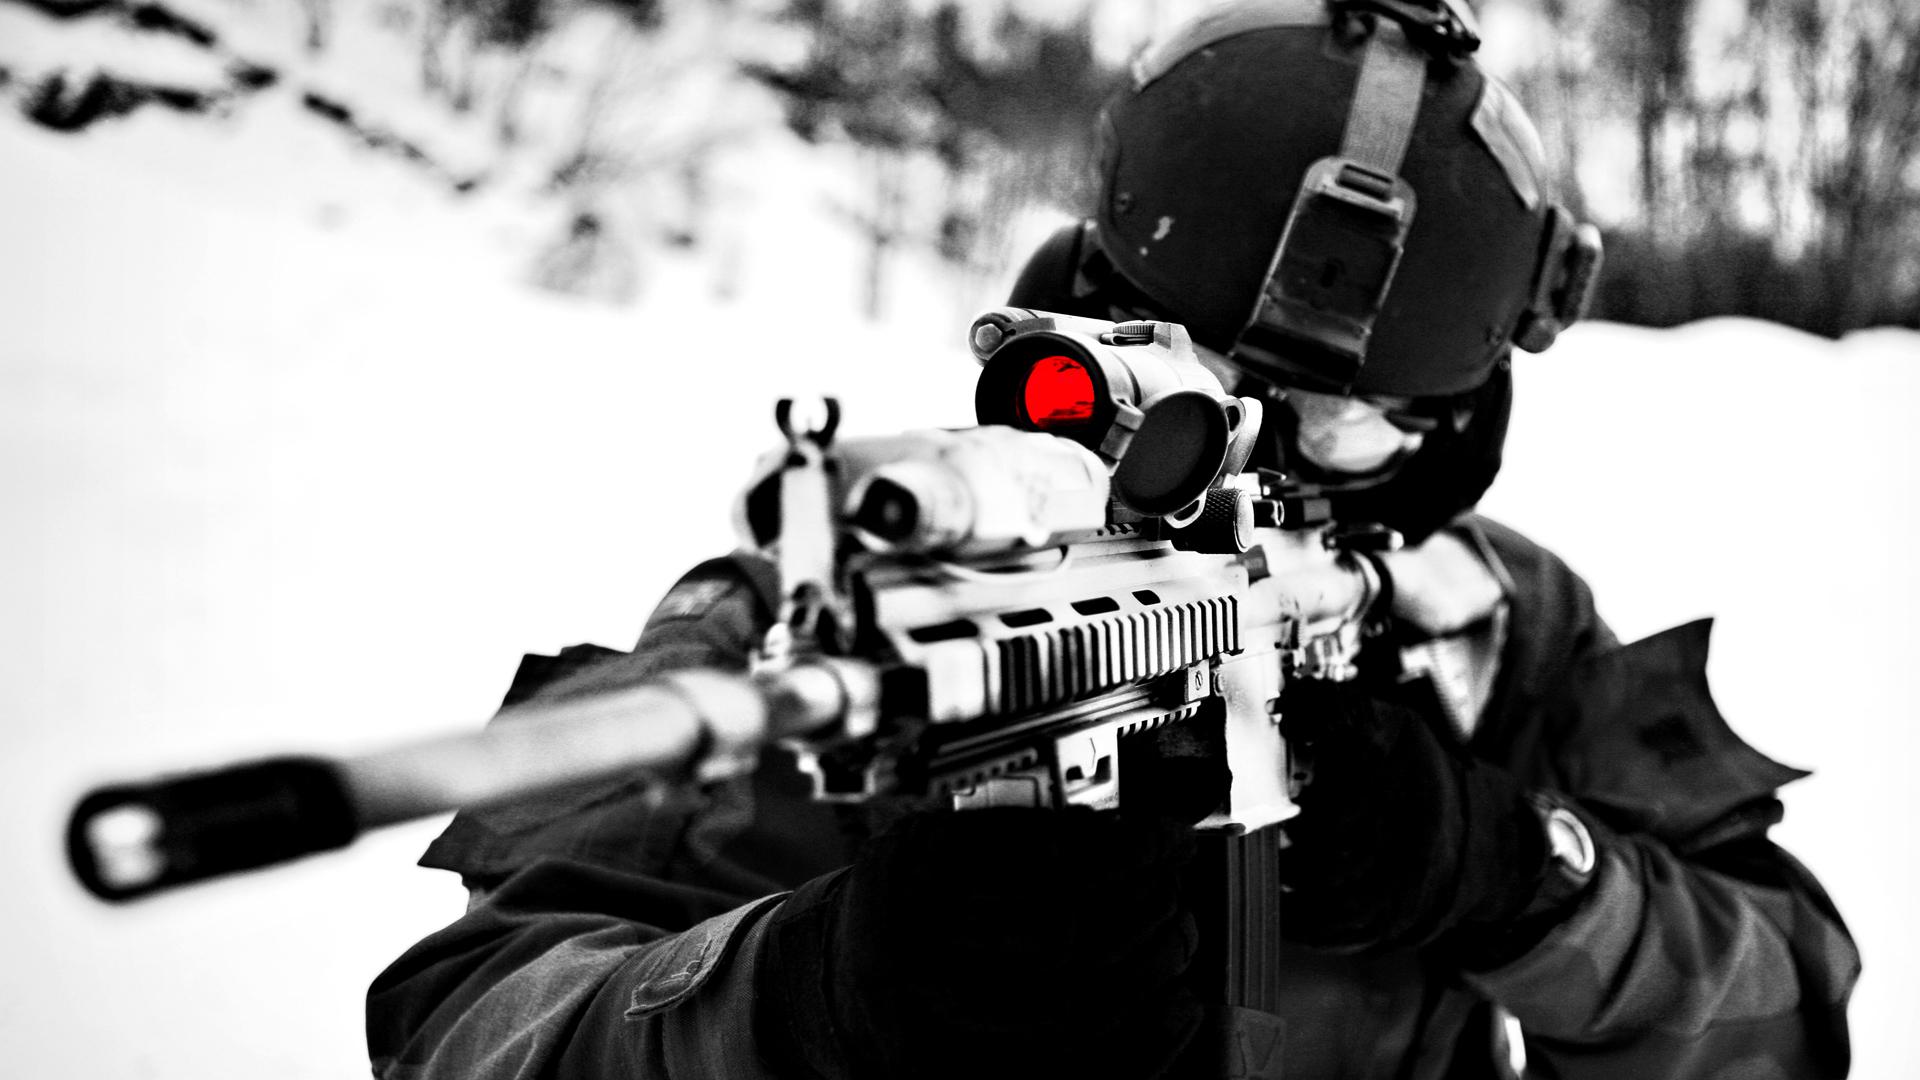 x-full-hd-p-gun-weapons-jpg-778097